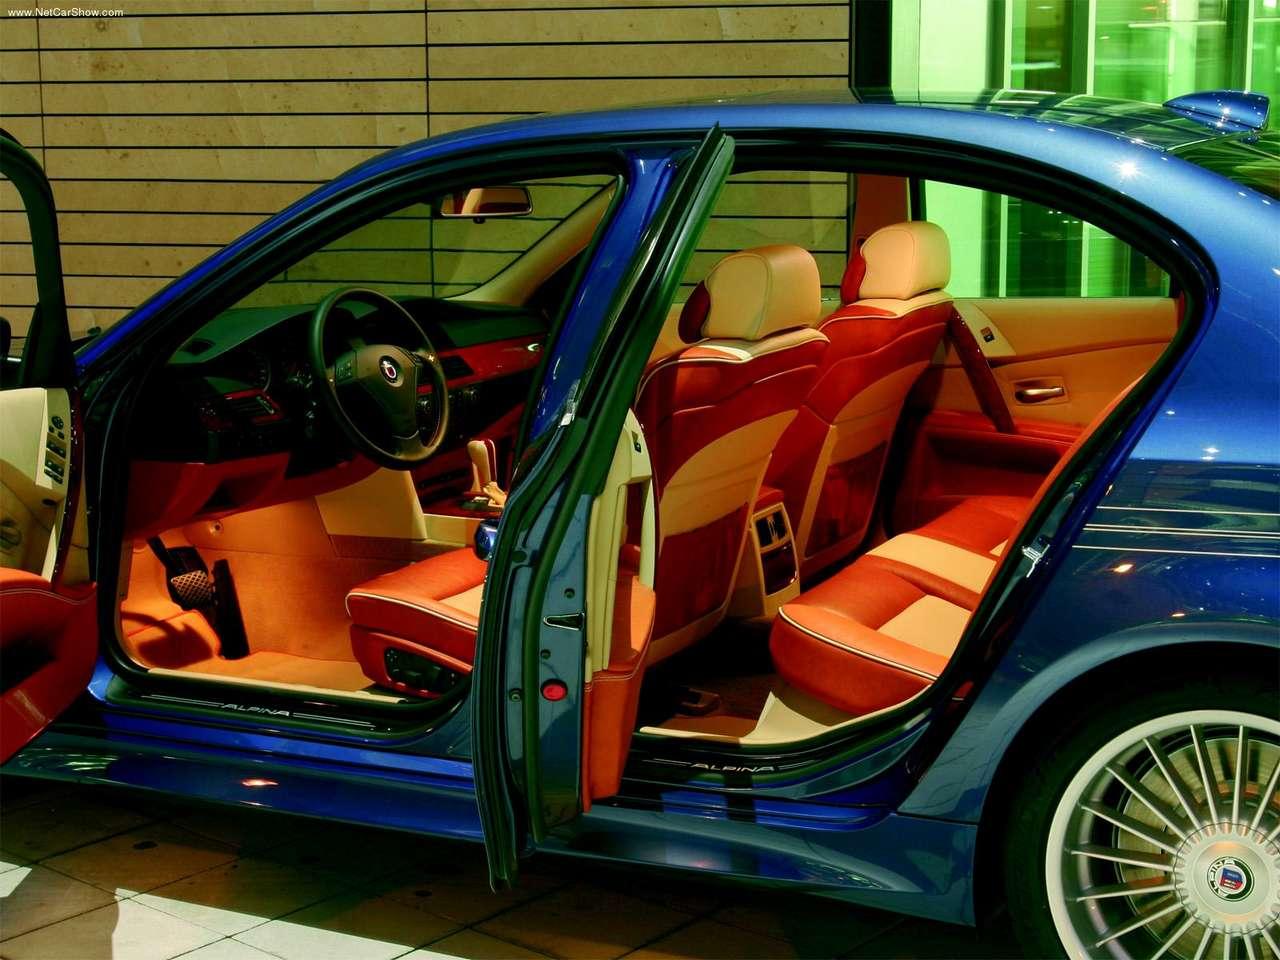 Alpina BMW B5 2005 Alpina-BMW_B5-2005-1280-03